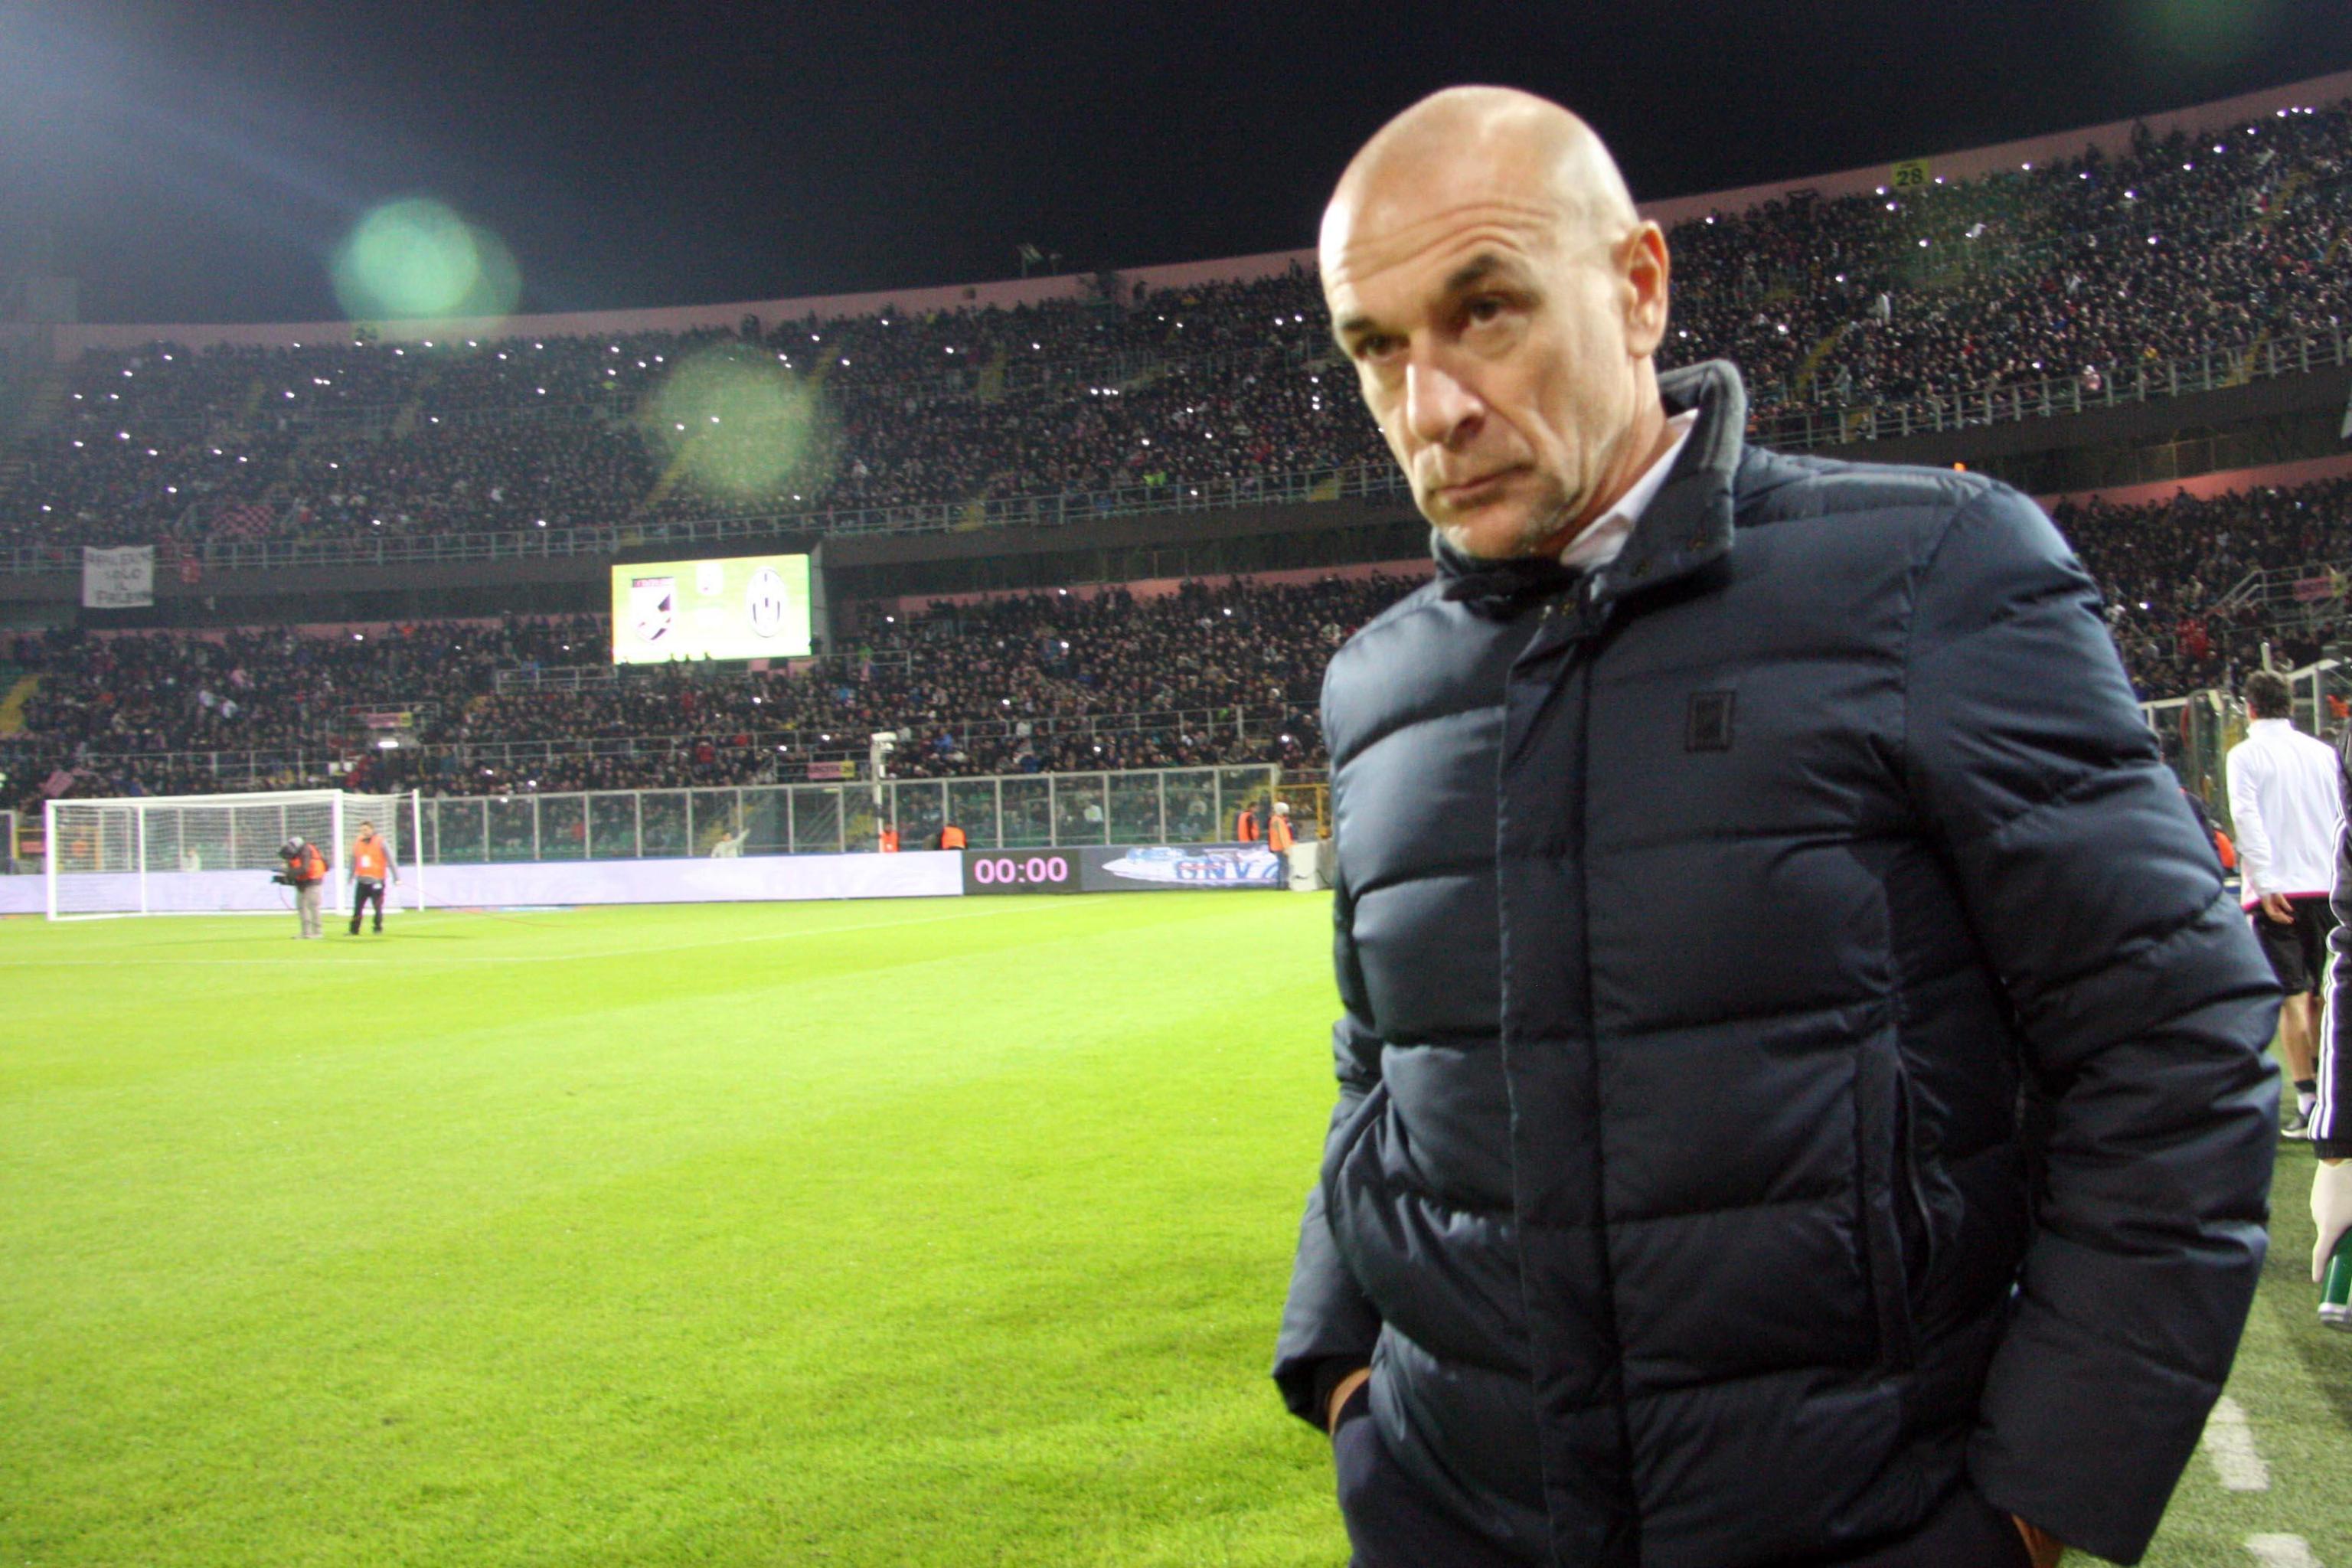 Calcio: serie A, Palermo-Juventus